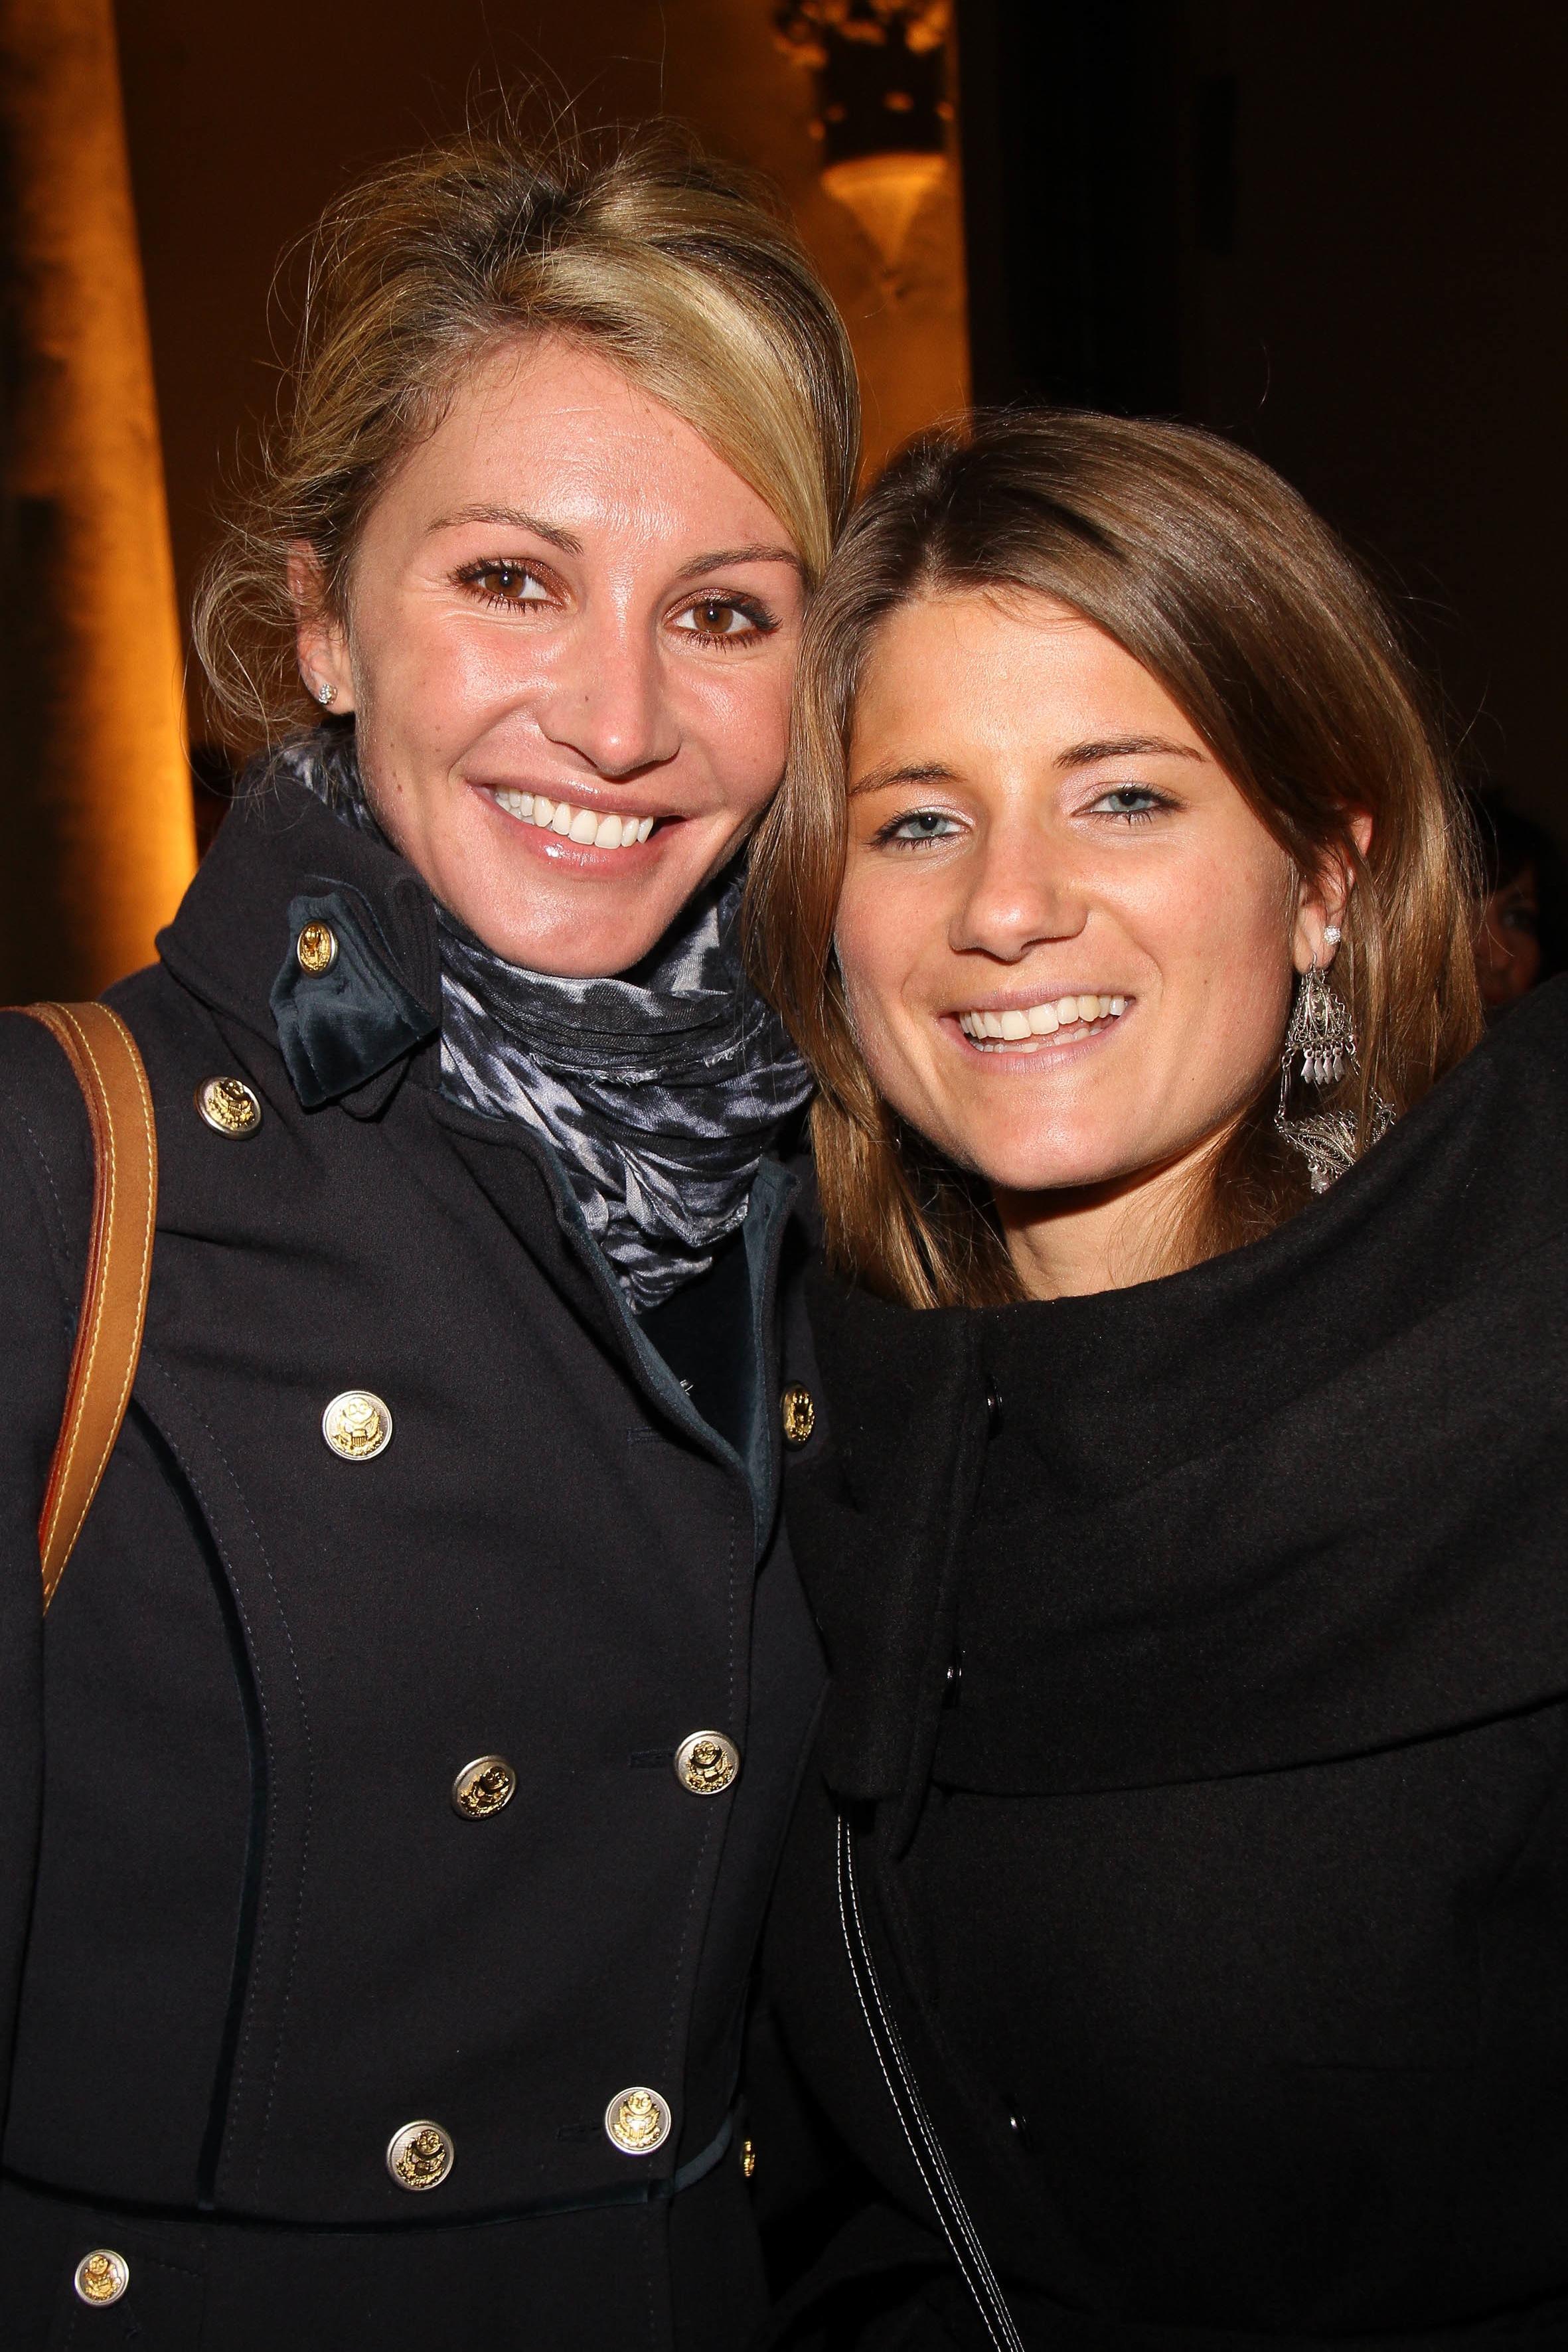 PRESSPHOTO  Firenze, Palazzo Antinori, festa Roy Rogers. Nella foto Ginevra Pontello e Francesca Vannucchi